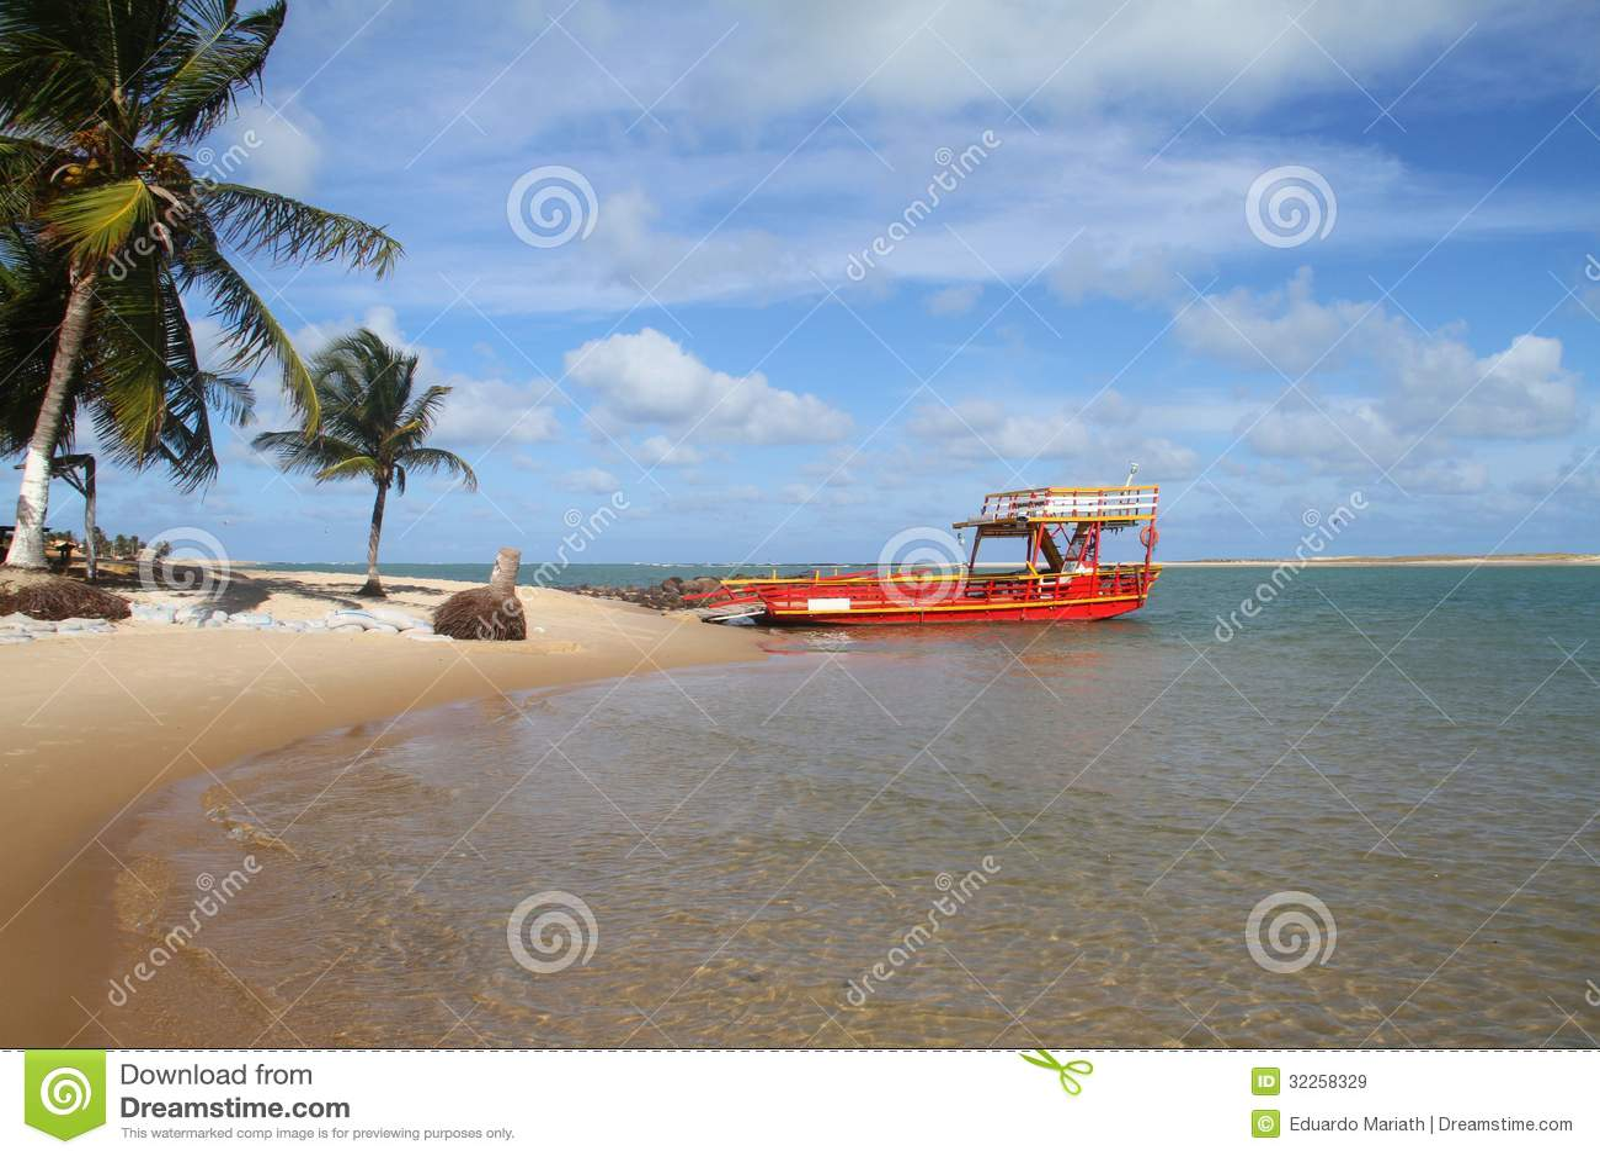 El transbordador rojo - Sibauma - Barra hace Cunhaú - Pipa de DA del Praia